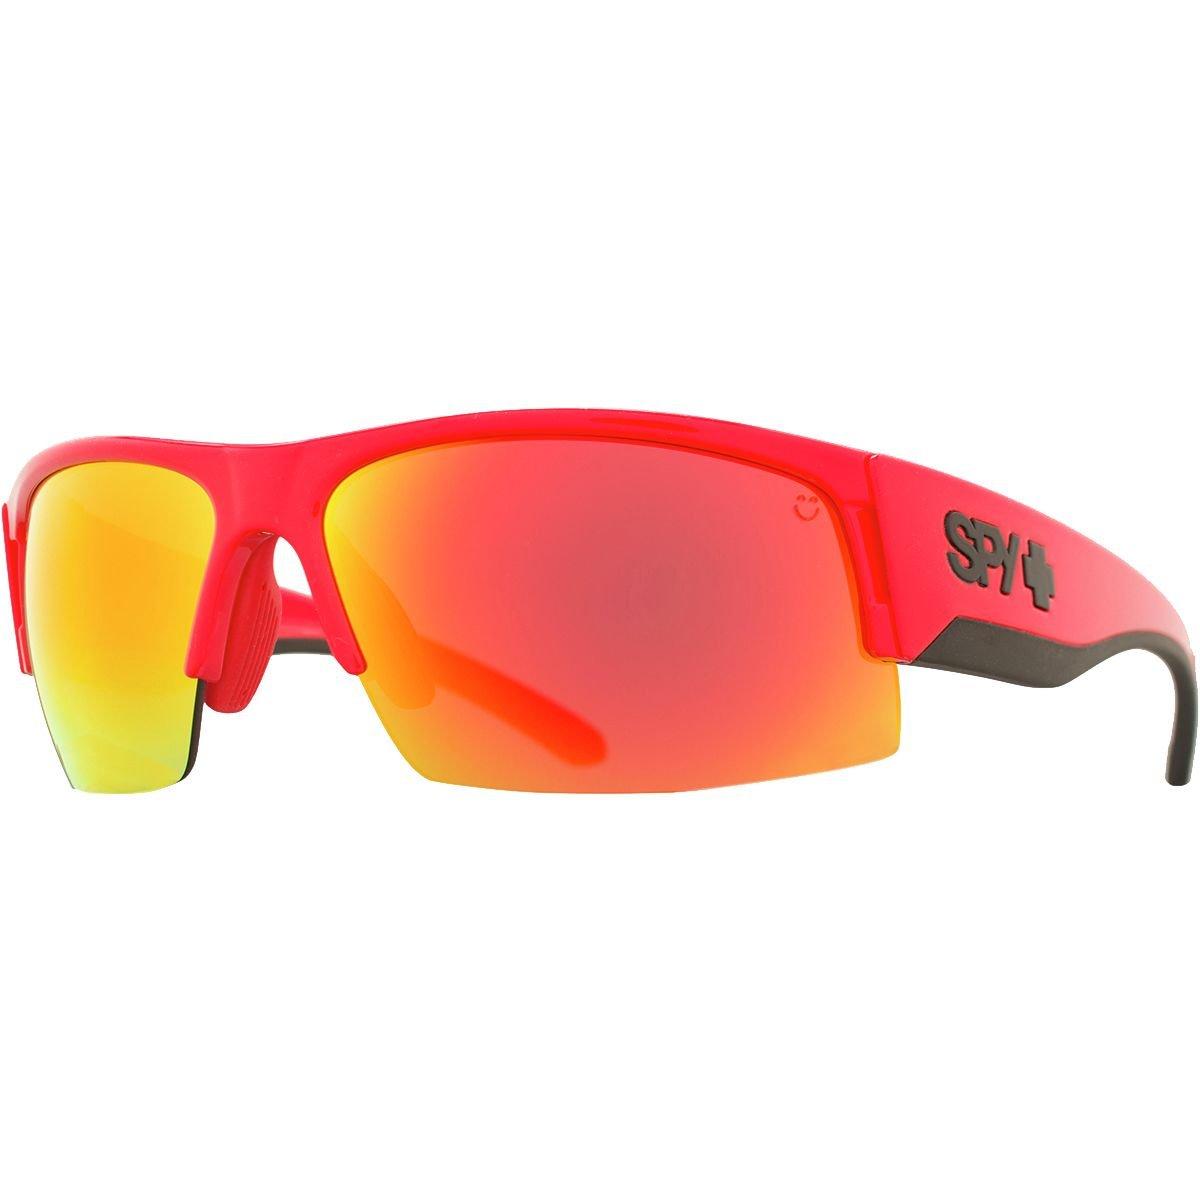 Shatter Resistant SPY Optic Flyer Transparent Performance Sunglasses